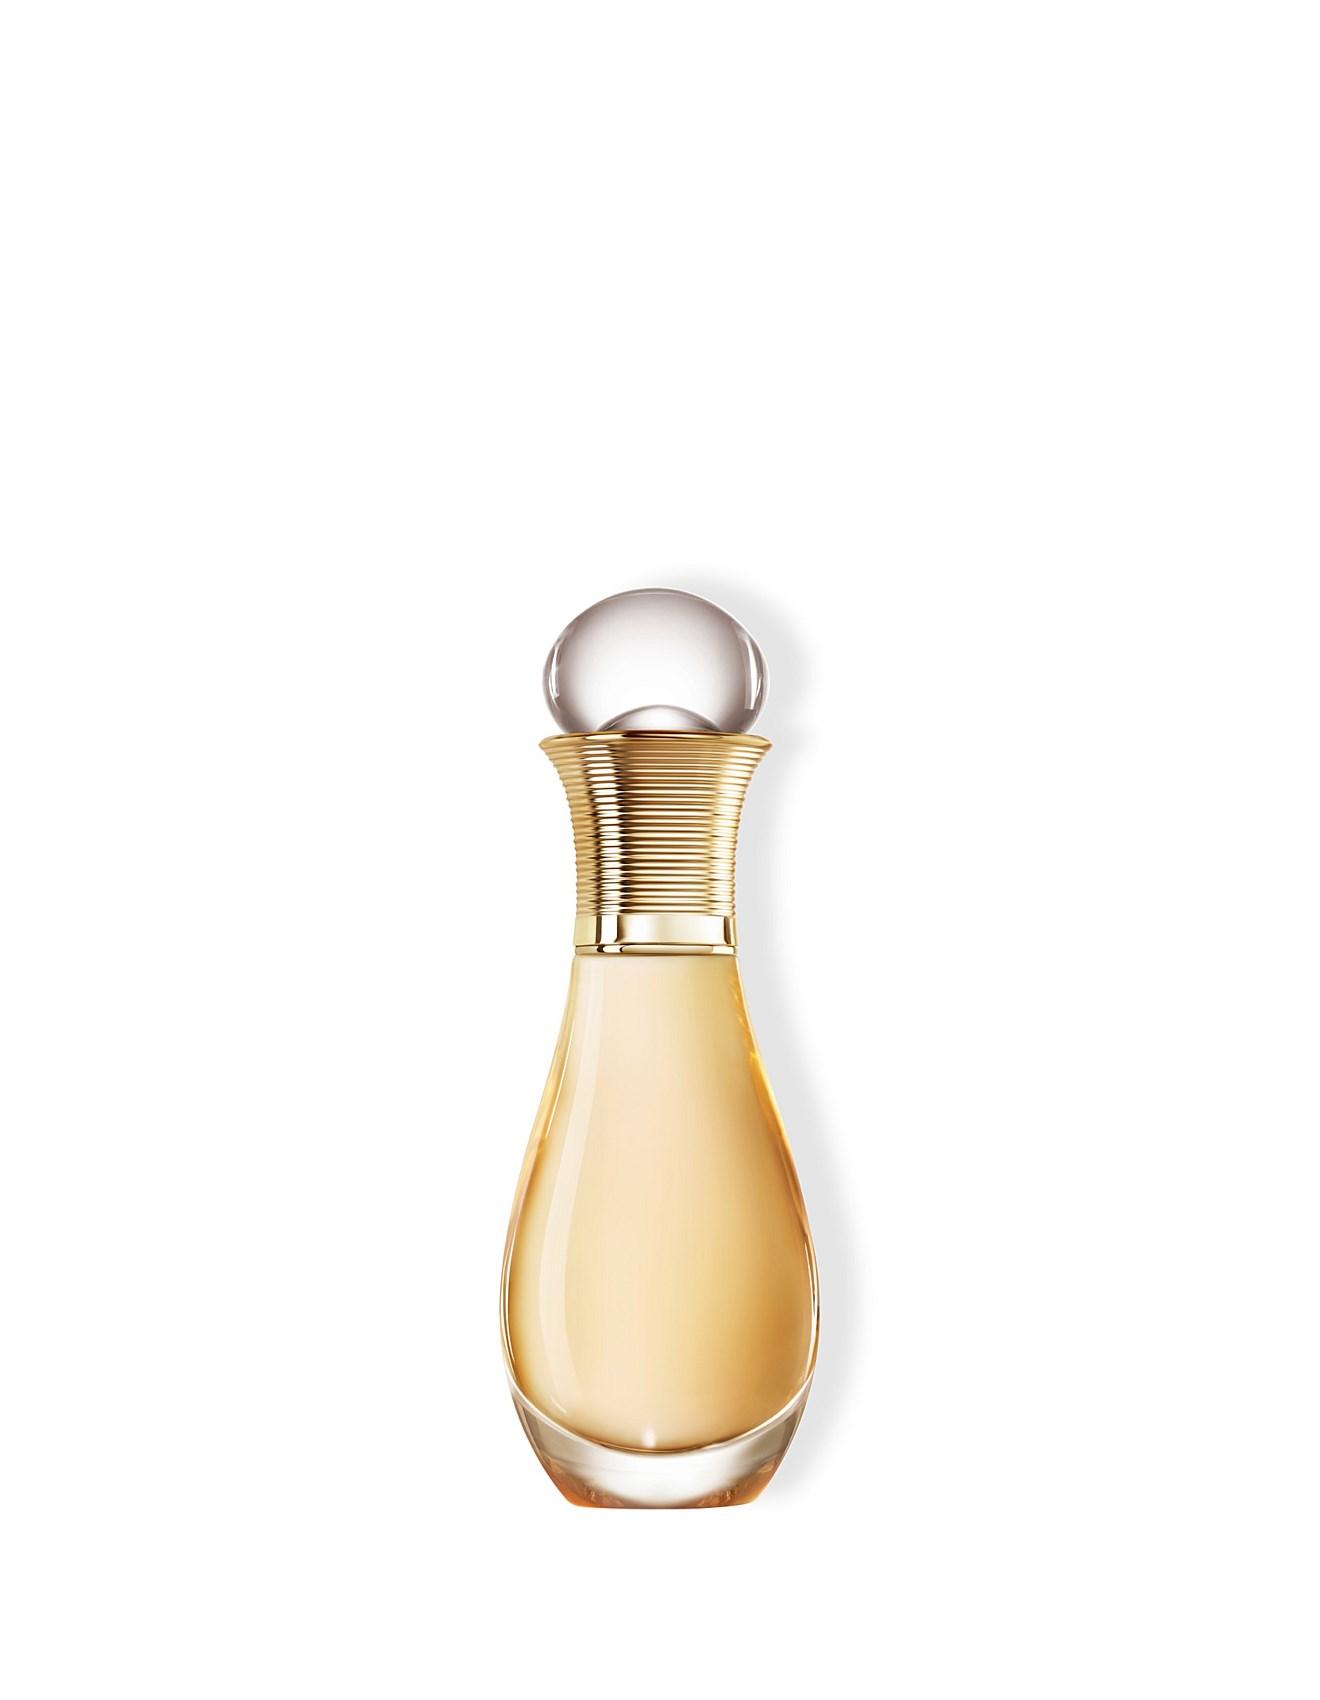 j 39 adore j 39 adore eau de parfum roller pearl. Black Bedroom Furniture Sets. Home Design Ideas